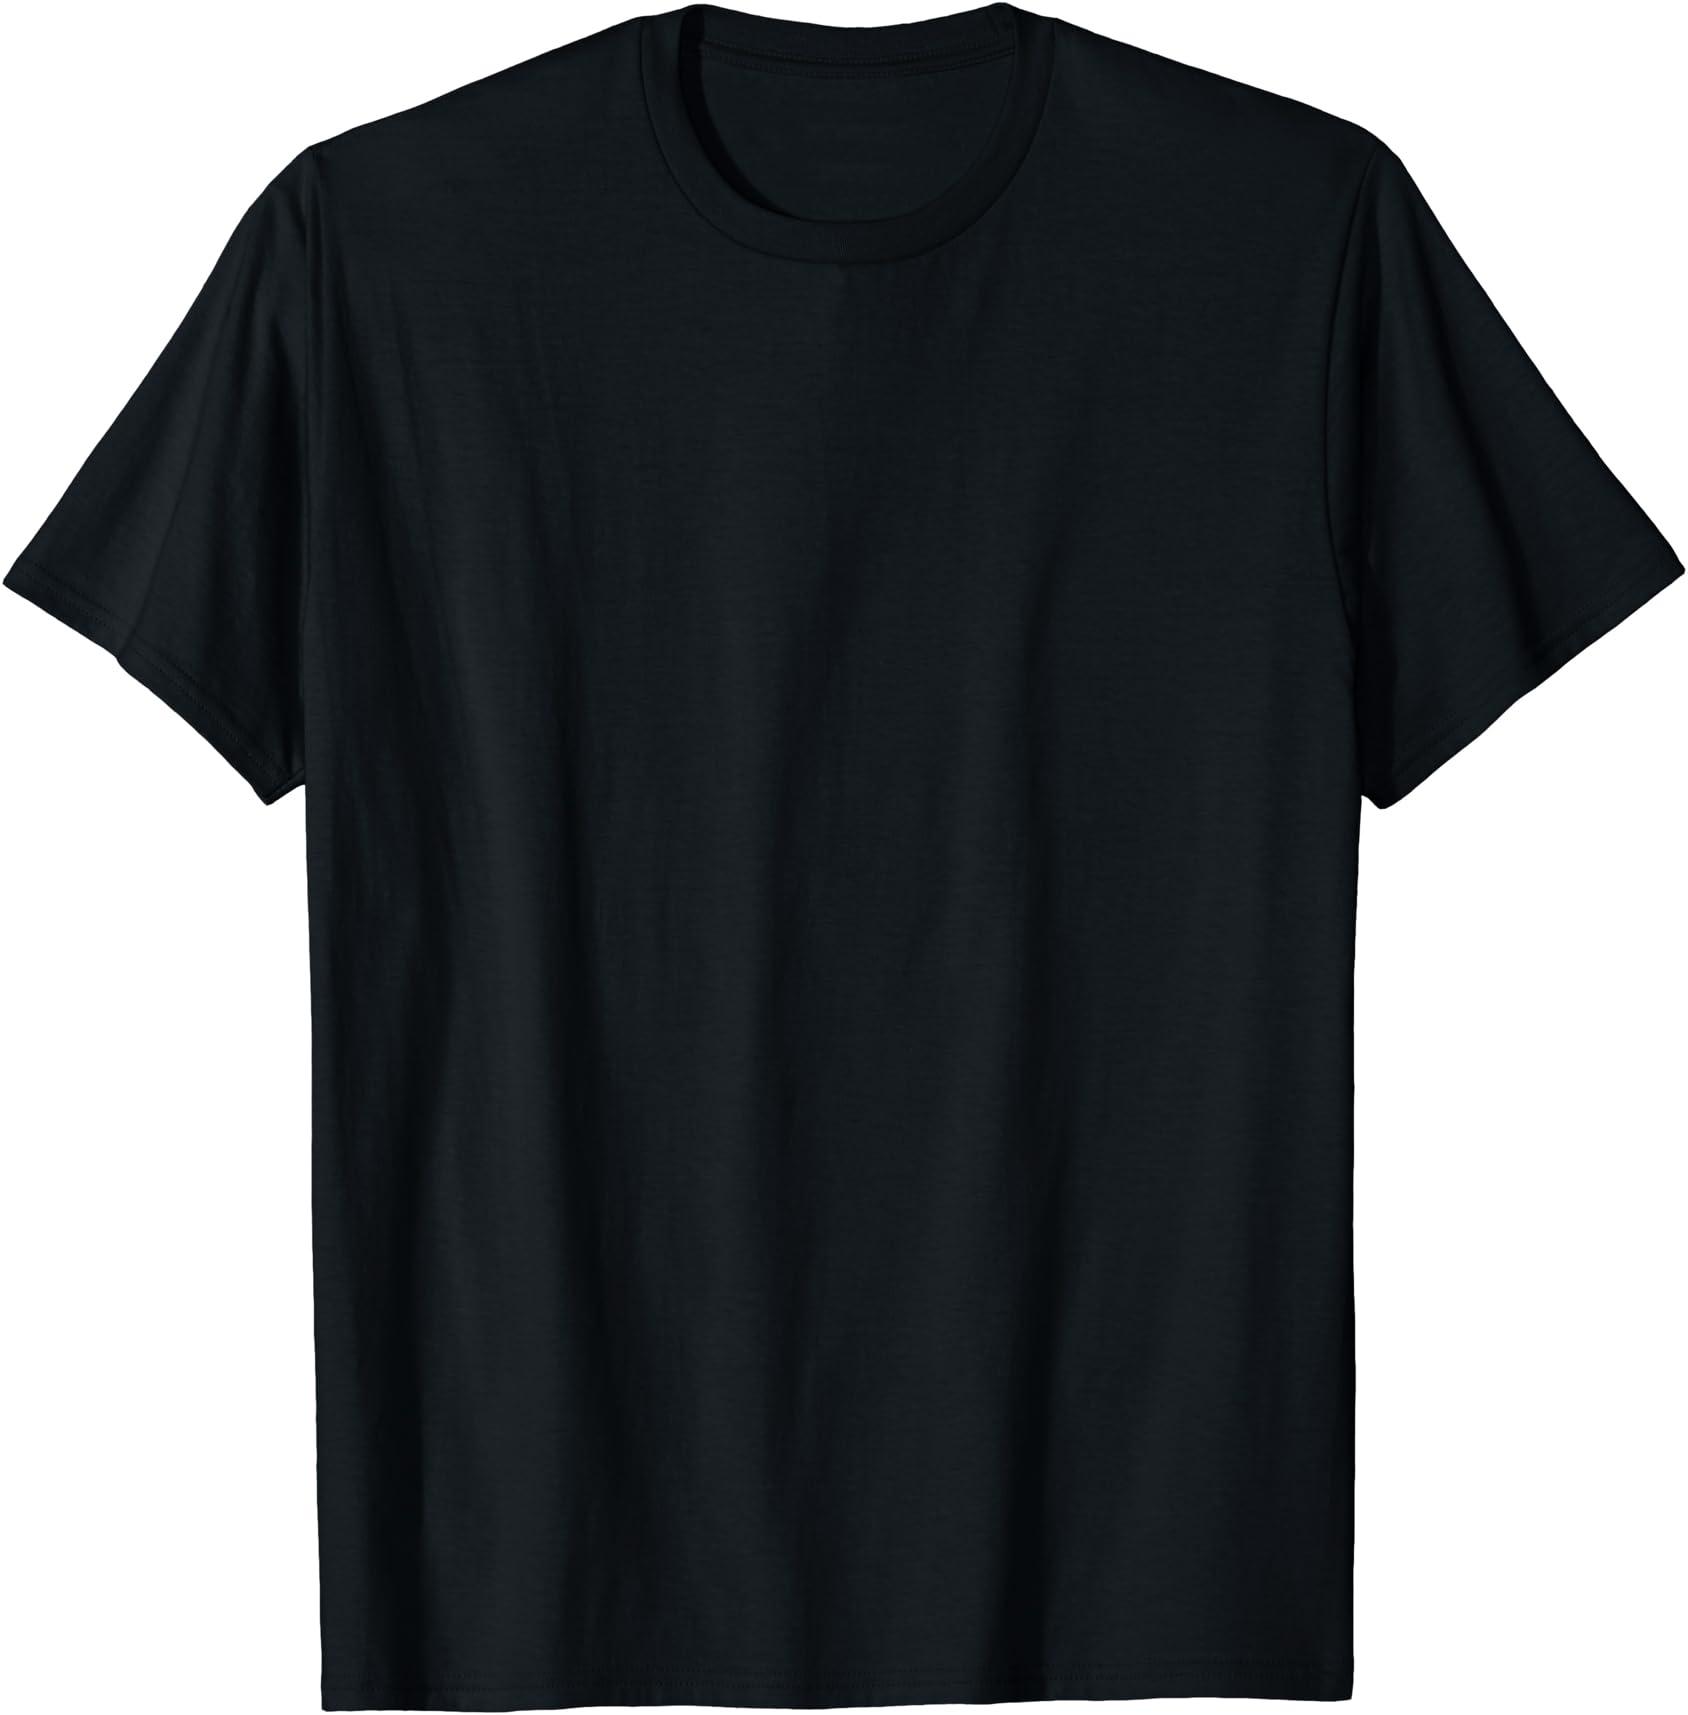 Dachshund Sausage Dog Animal Lover T-shirt Tee Gift